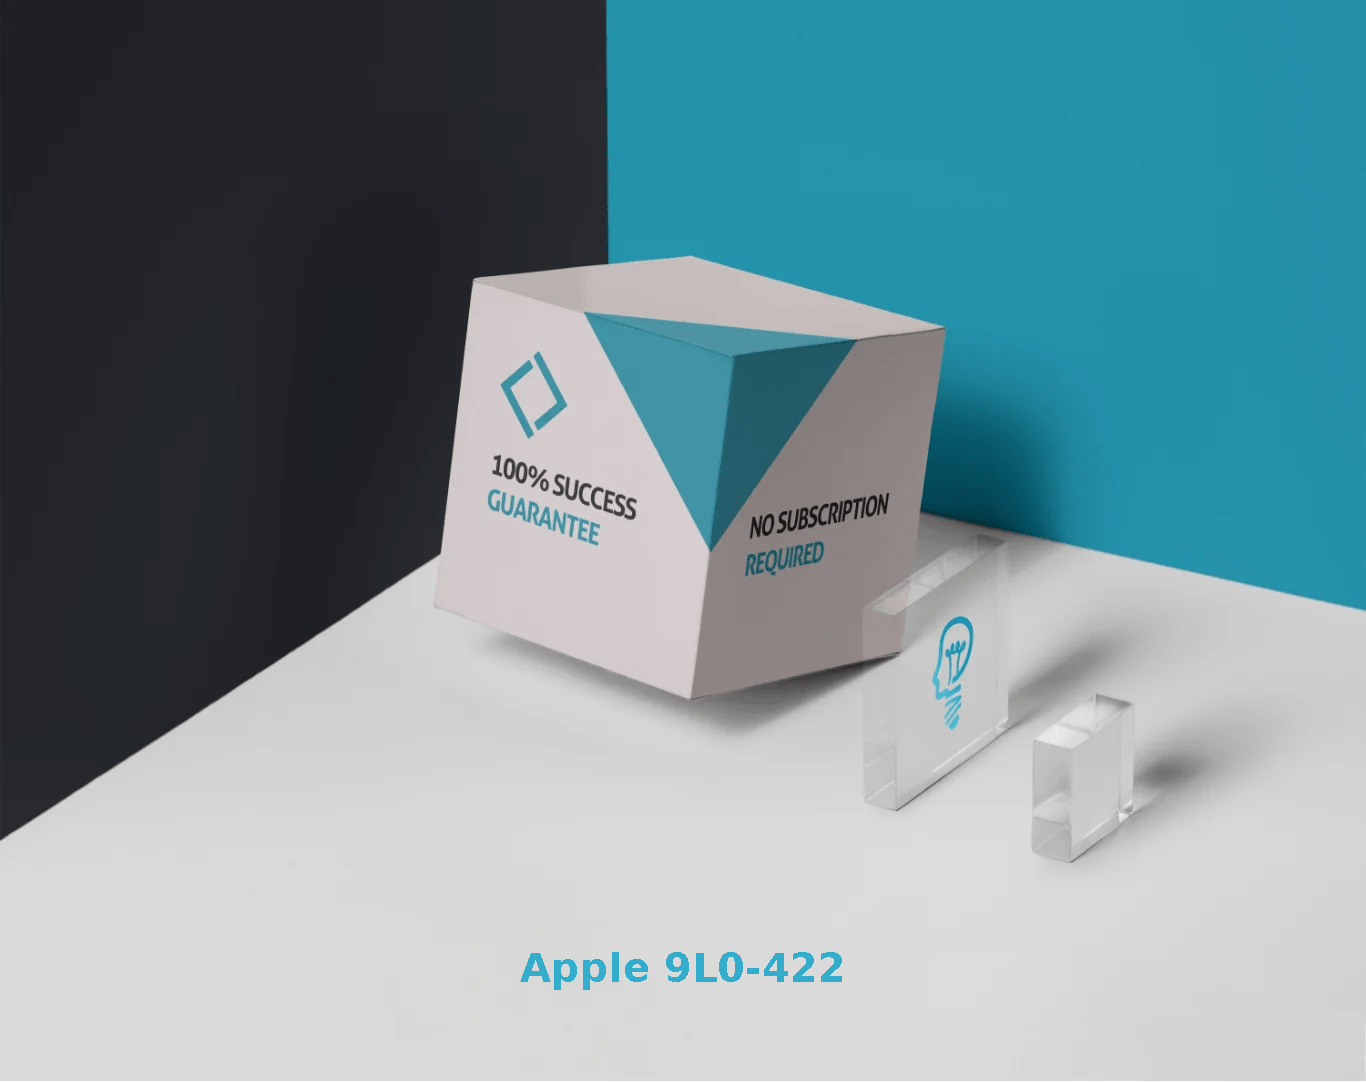 Apple 9L0-422 Exams